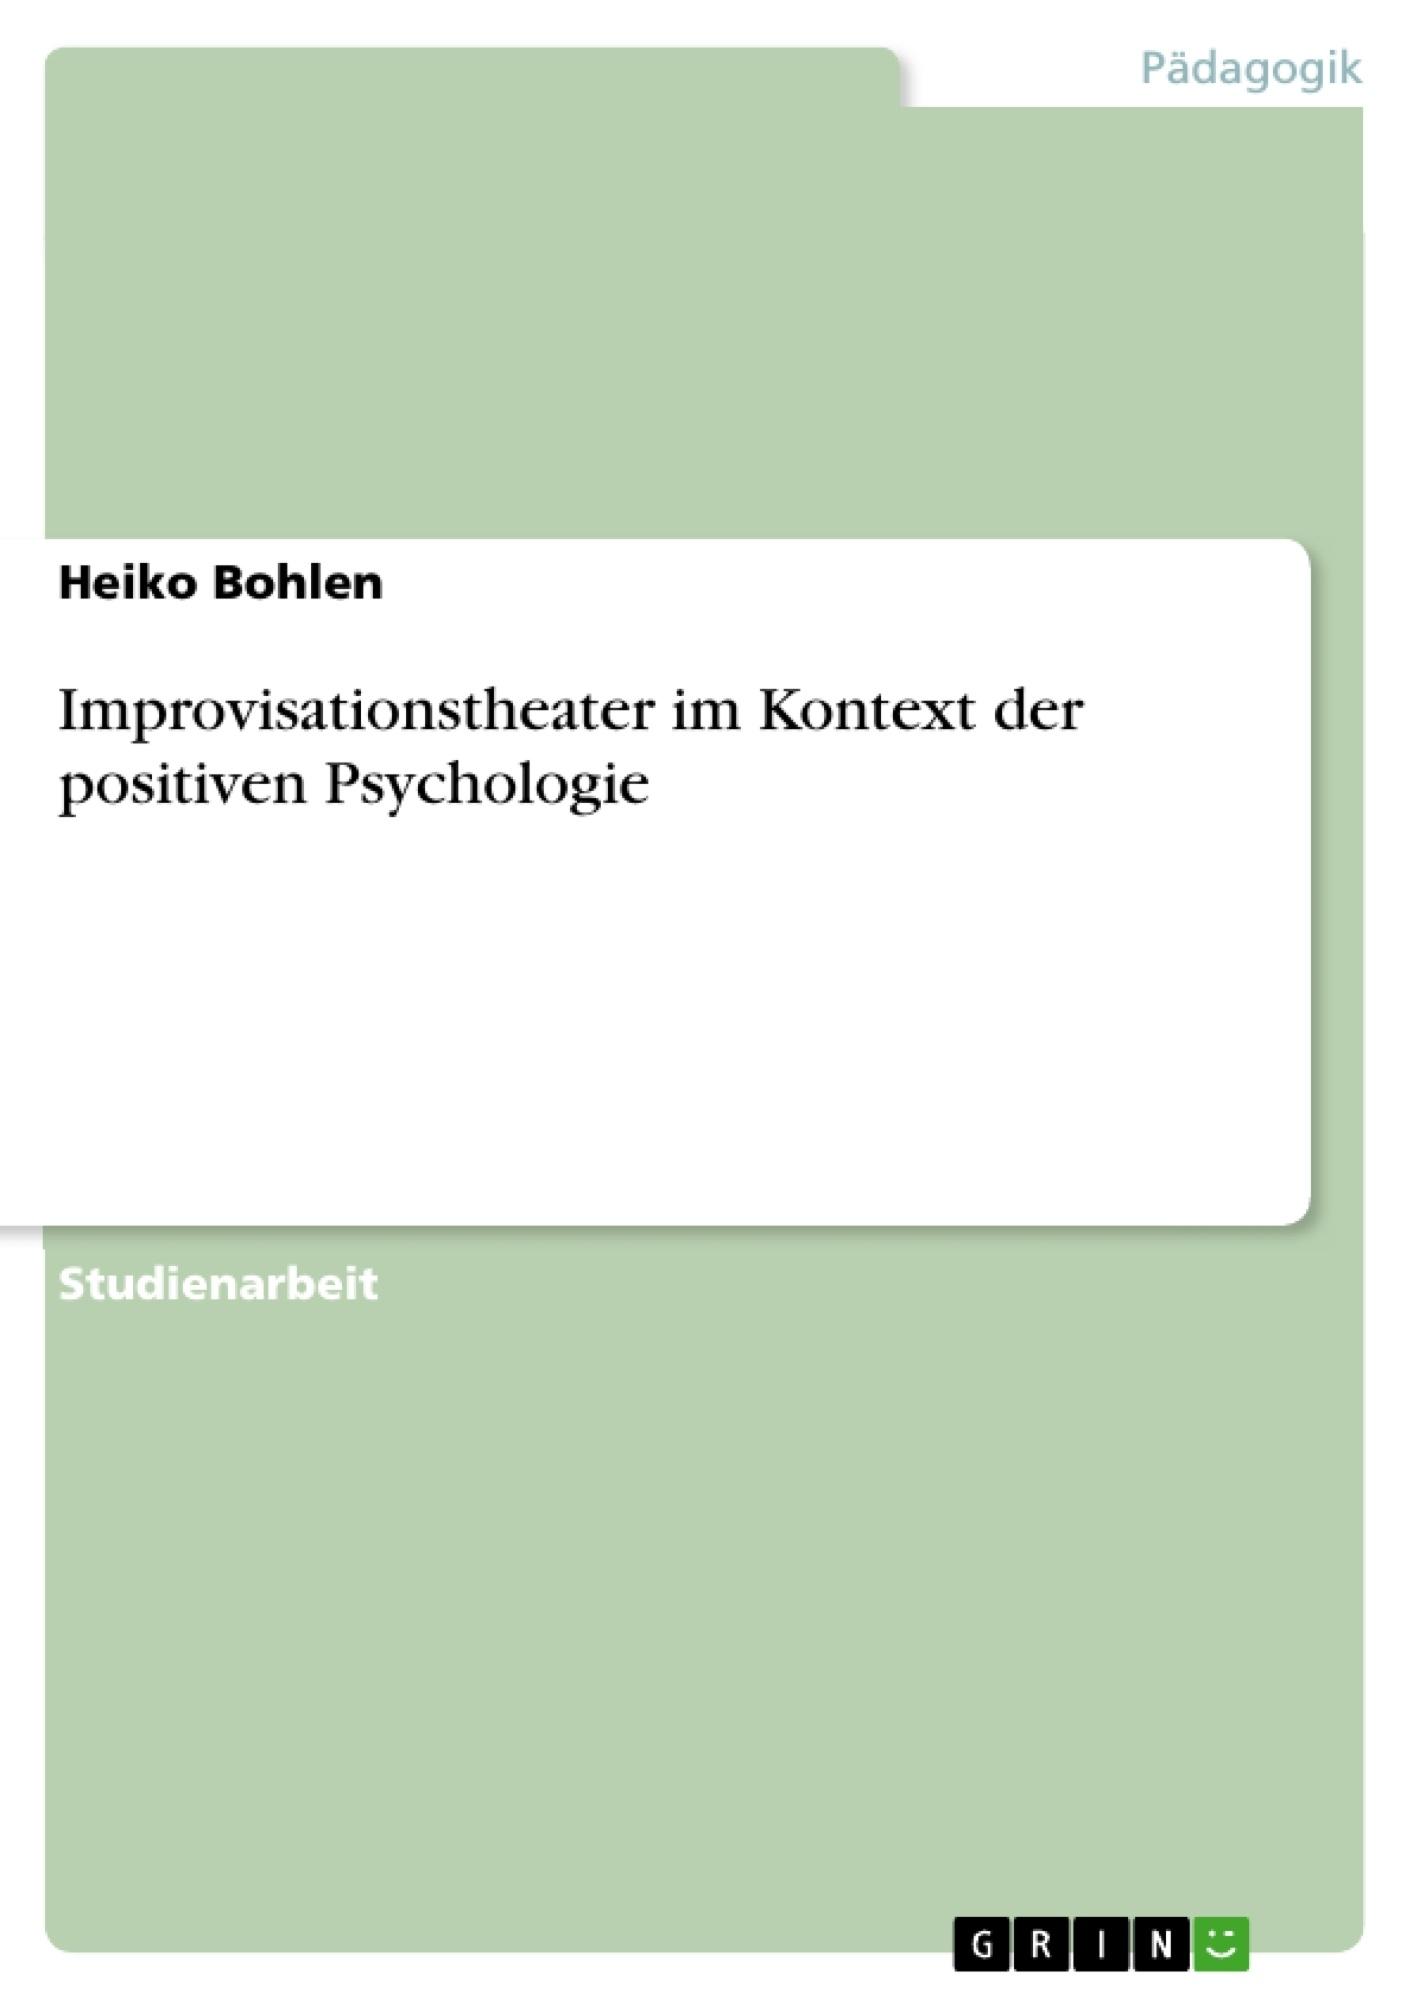 Title: Improvisationstheater im Kontext der positiven Psychologie